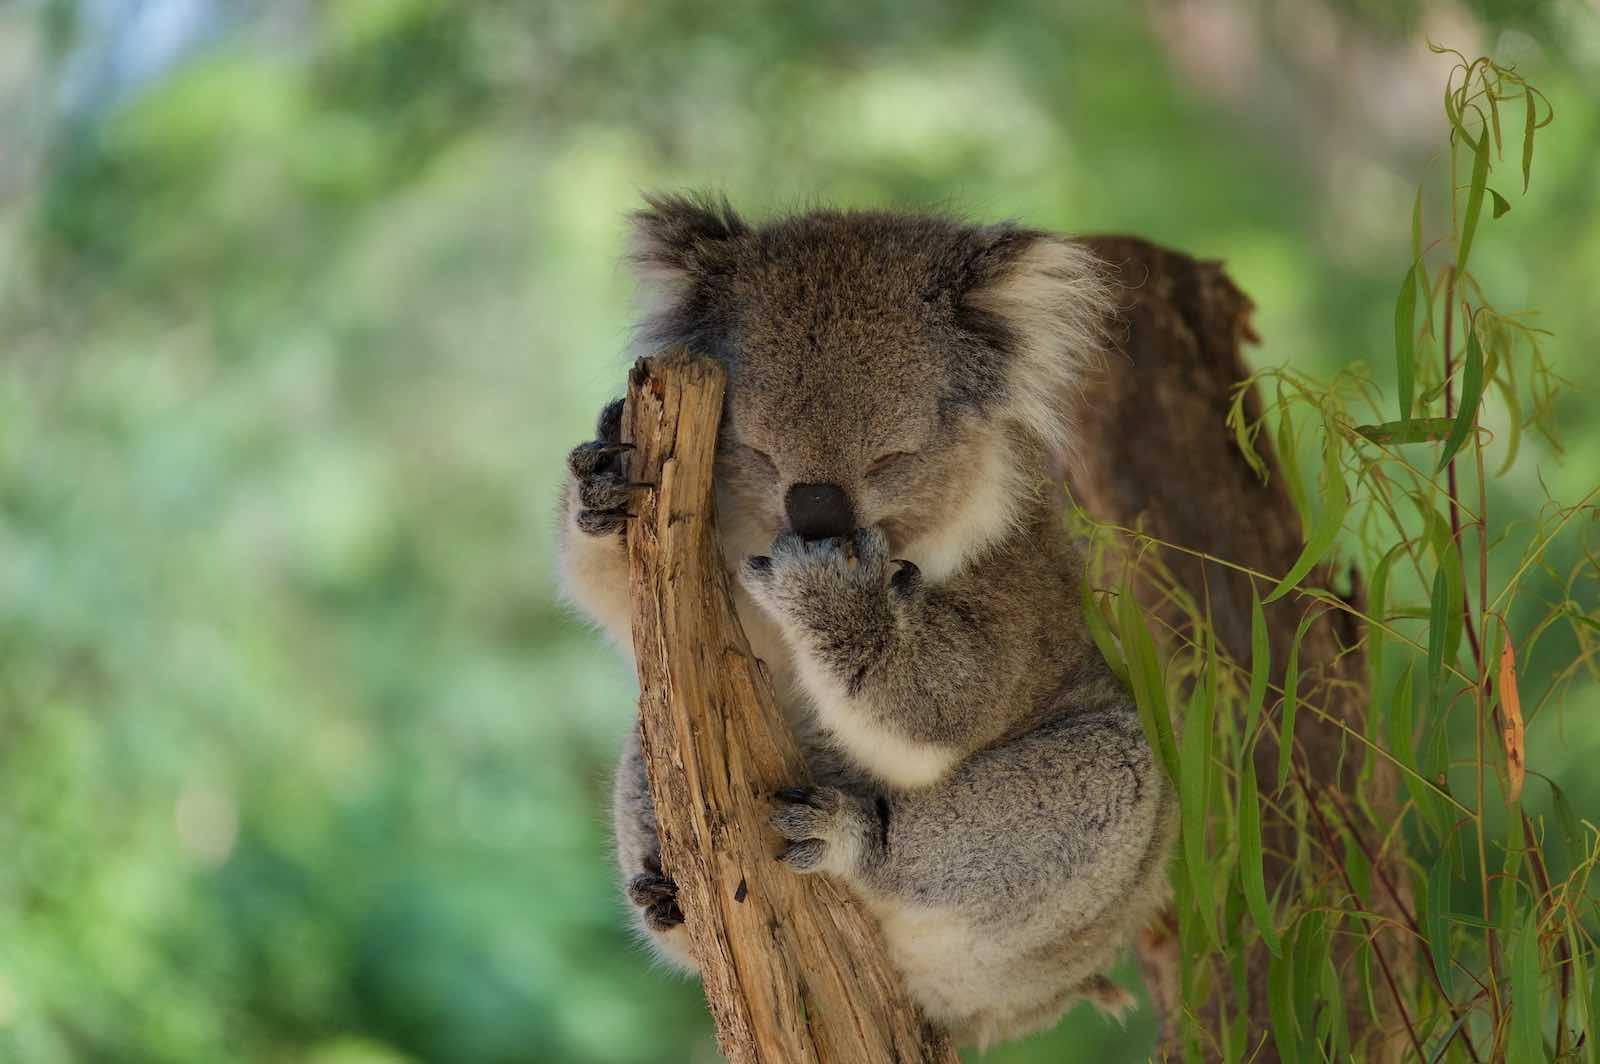 Koala – Phascolarctos cinereus (Marcus Hansson/Flickr)